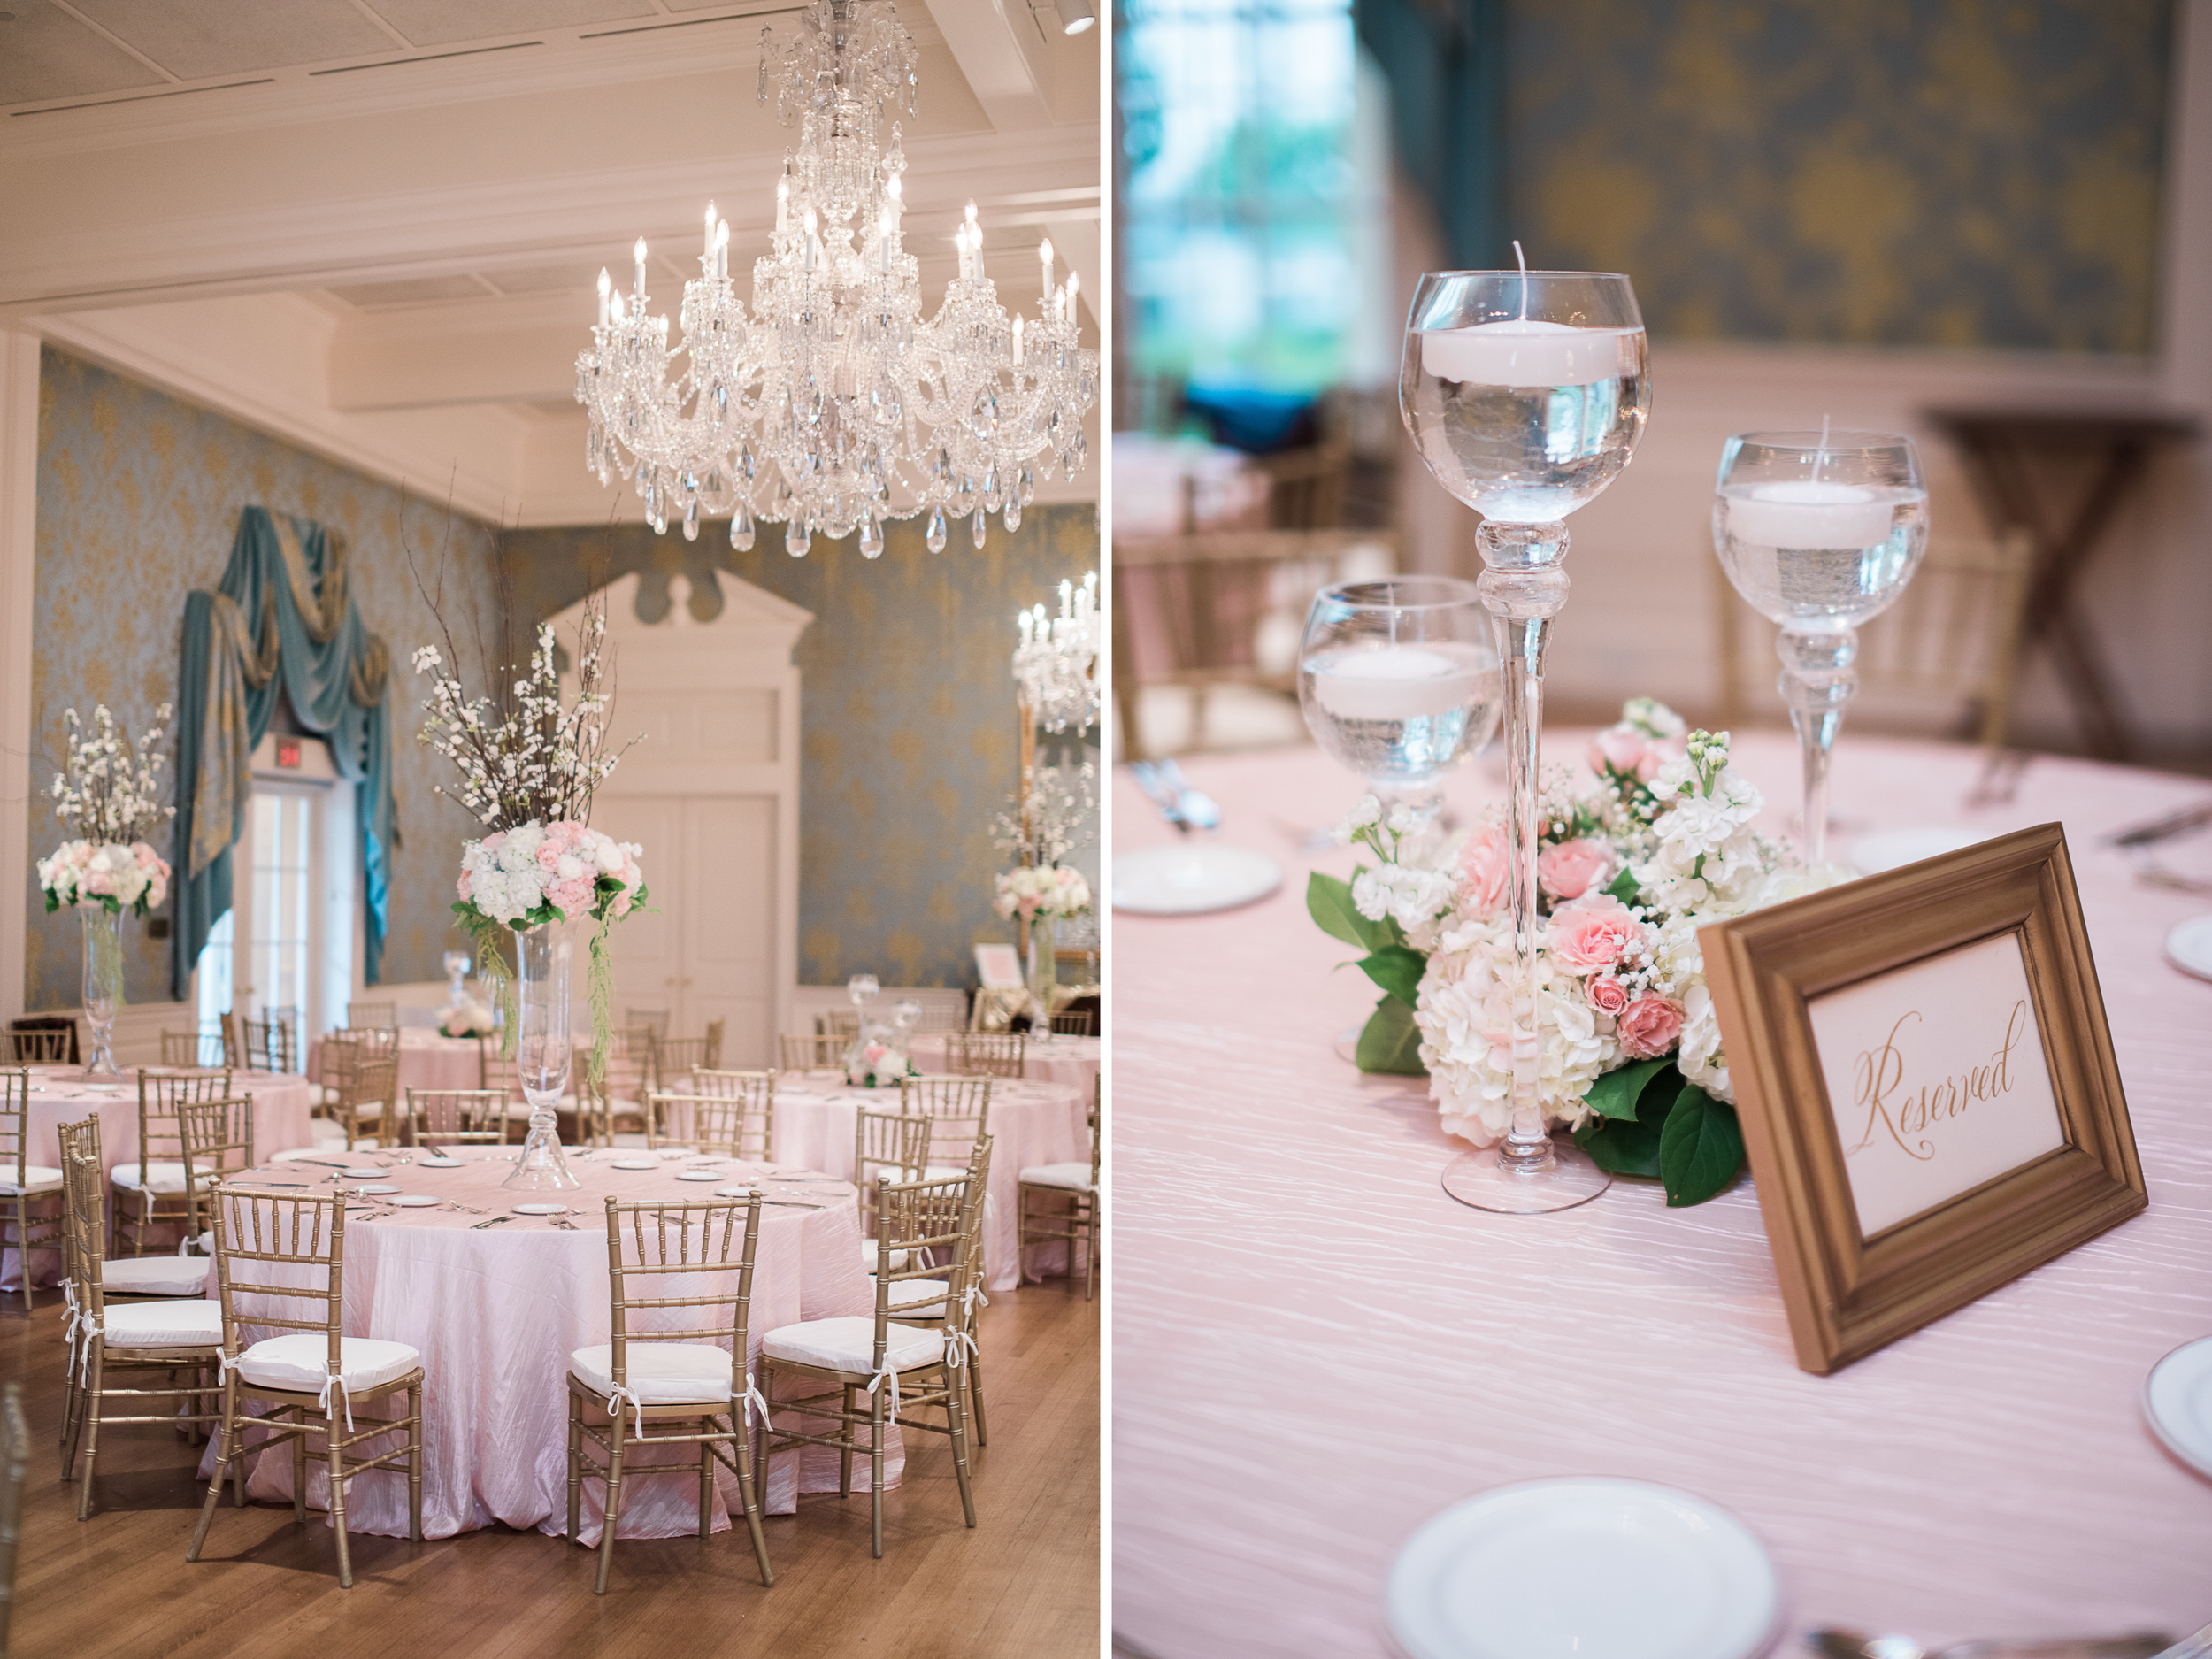 Dana-Fernandez-Photography-Weddings-in-Houston-Magazine-feature-Houston-wedding-photographer-film-109.jpg